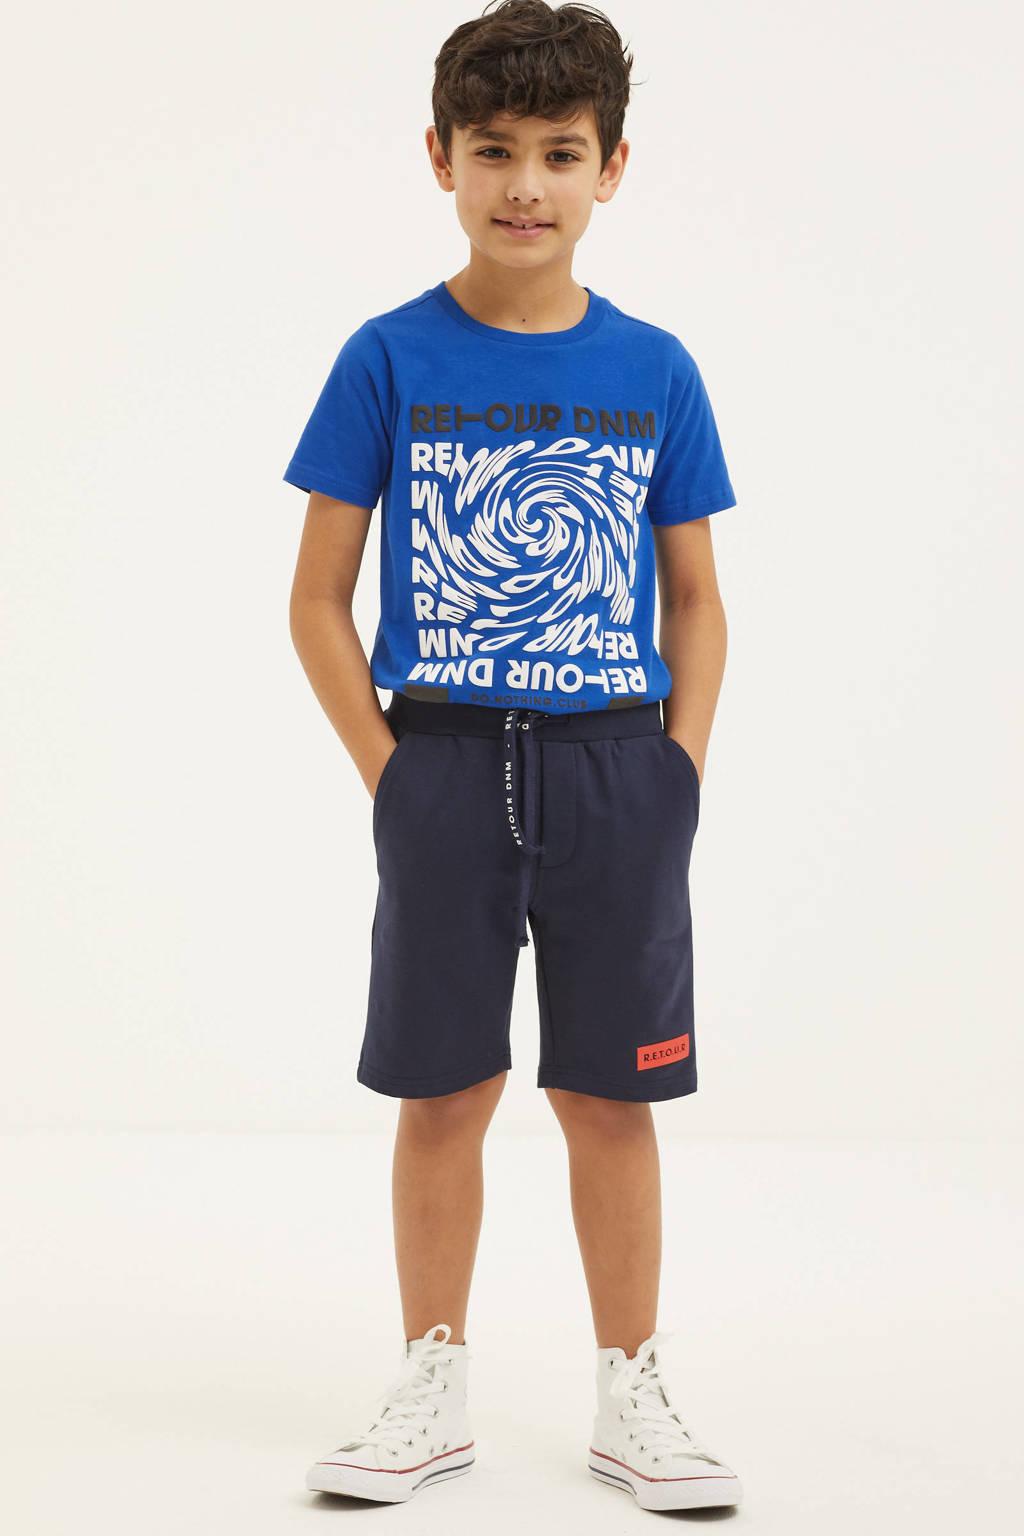 Retour Denim T-shirt Baldric met printopdruk hardblauw, Hardblauw